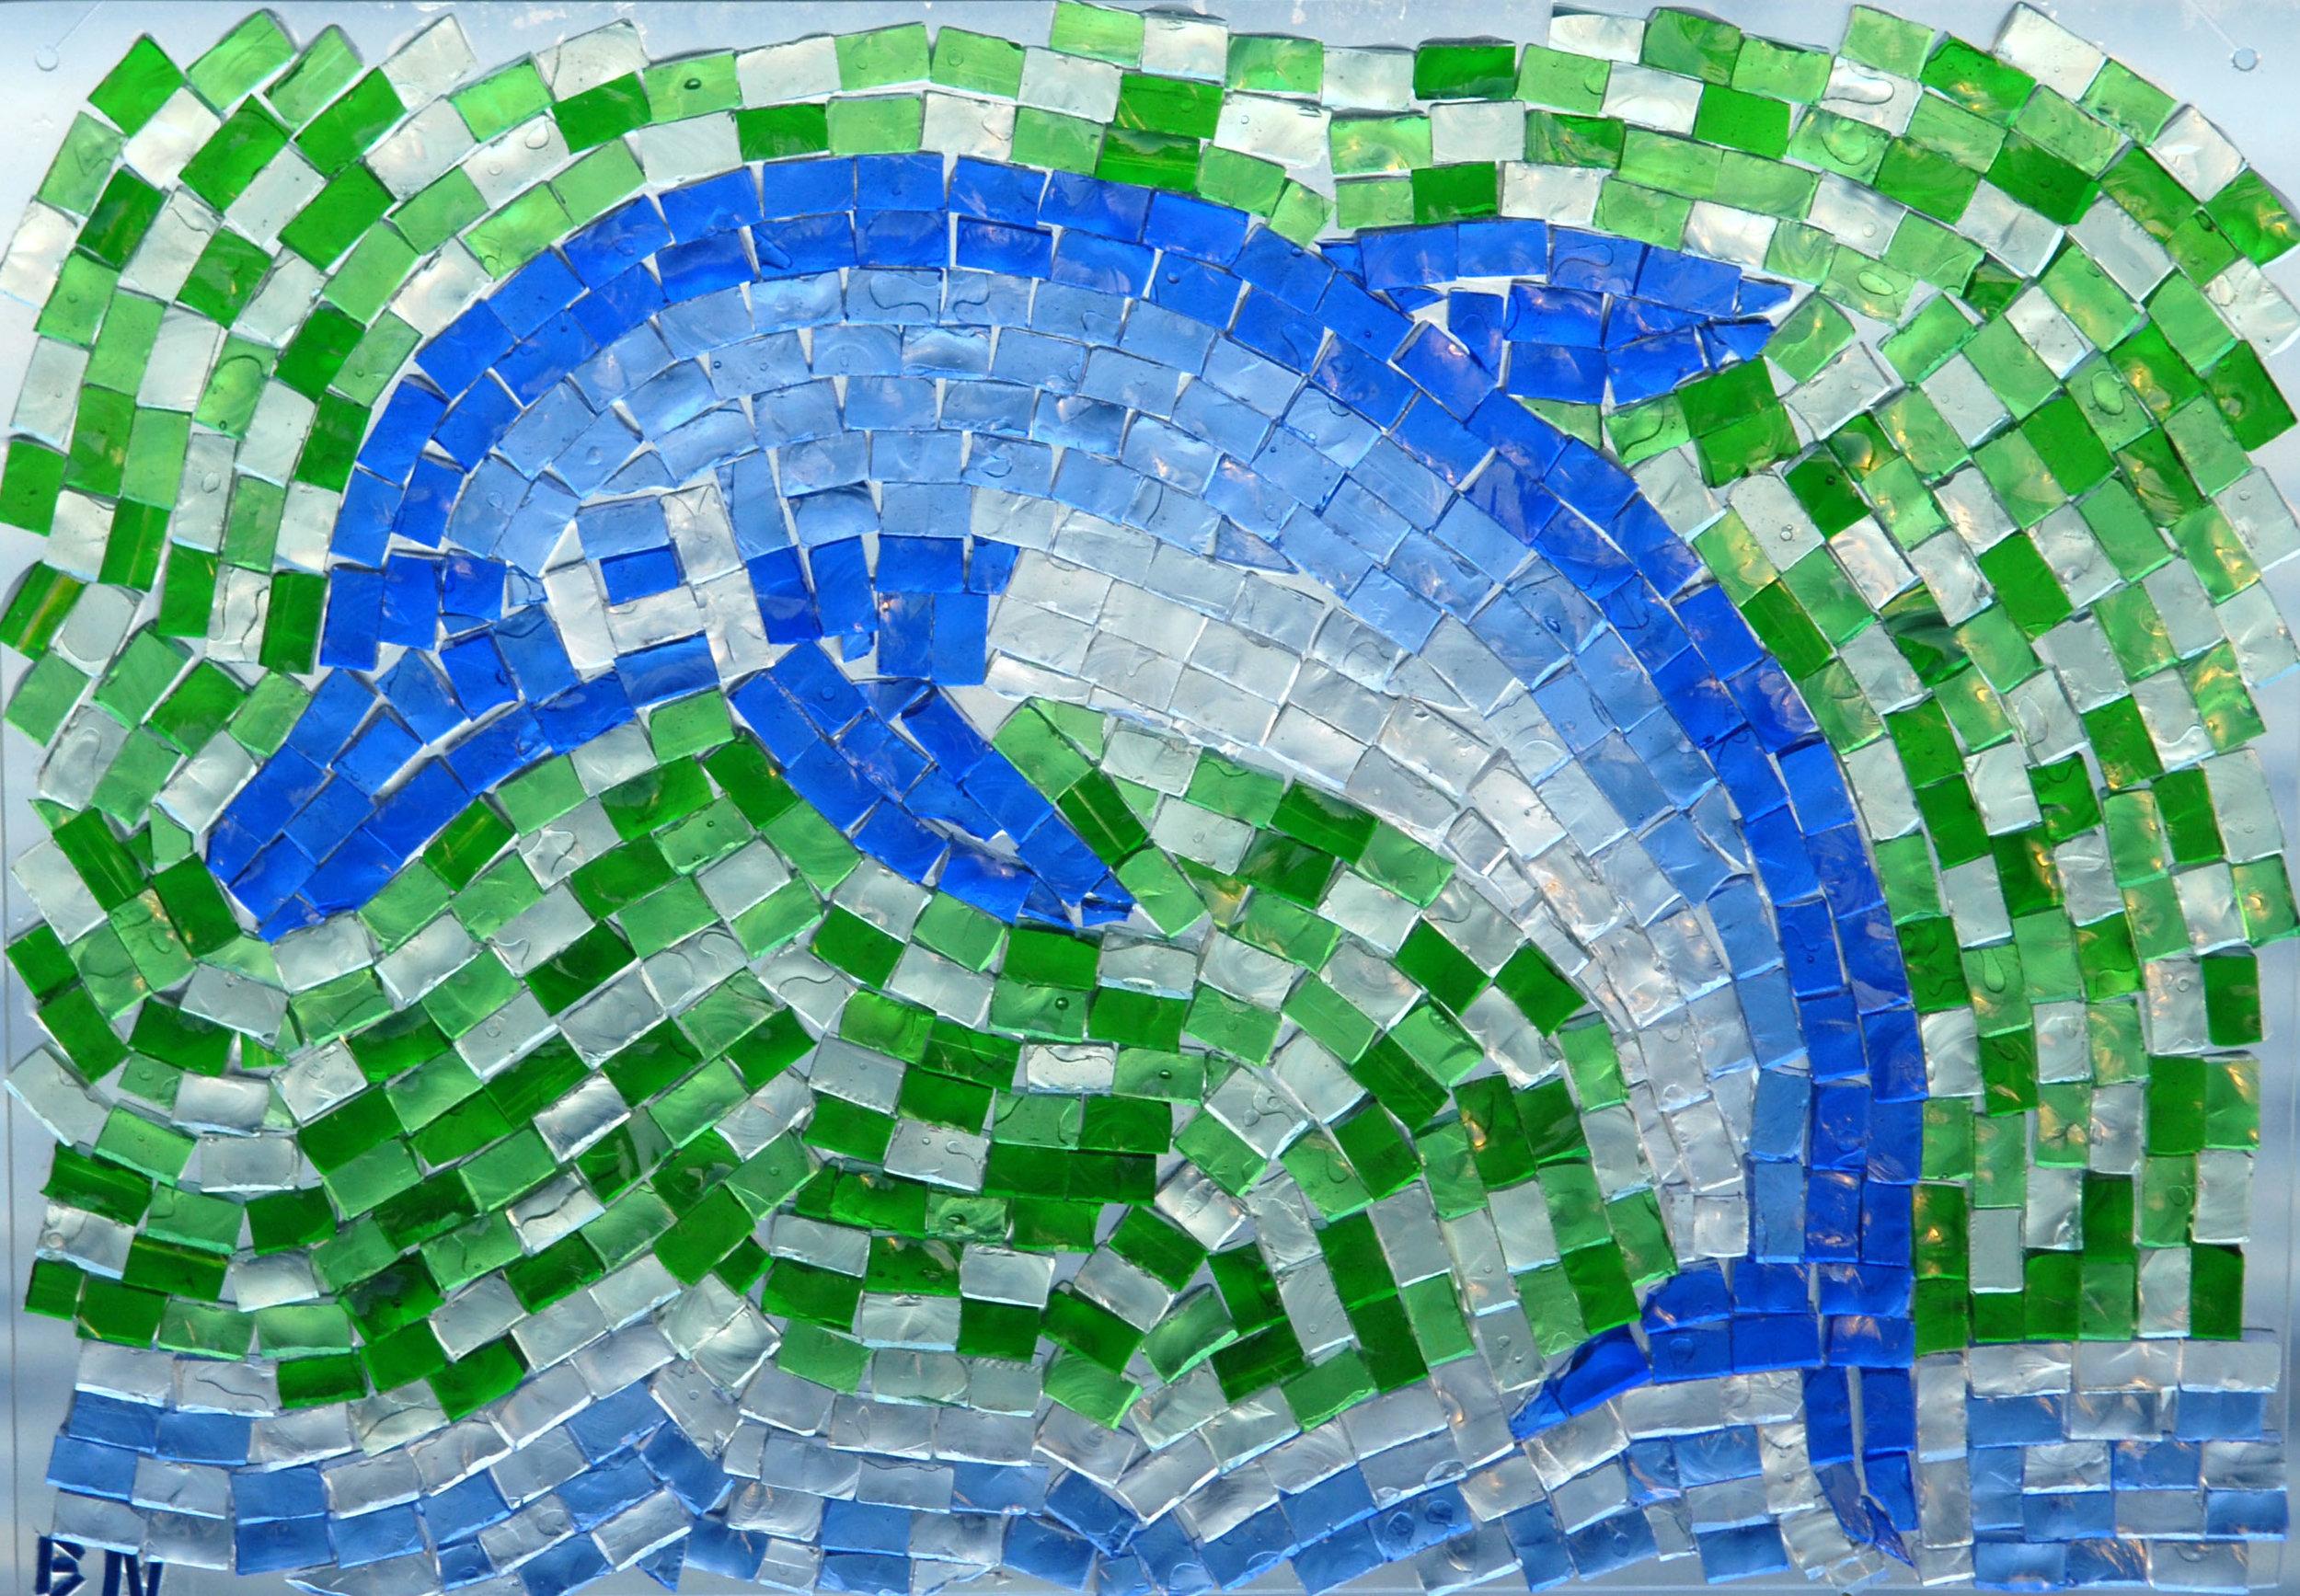 Dolphin, transparent glass mosaics